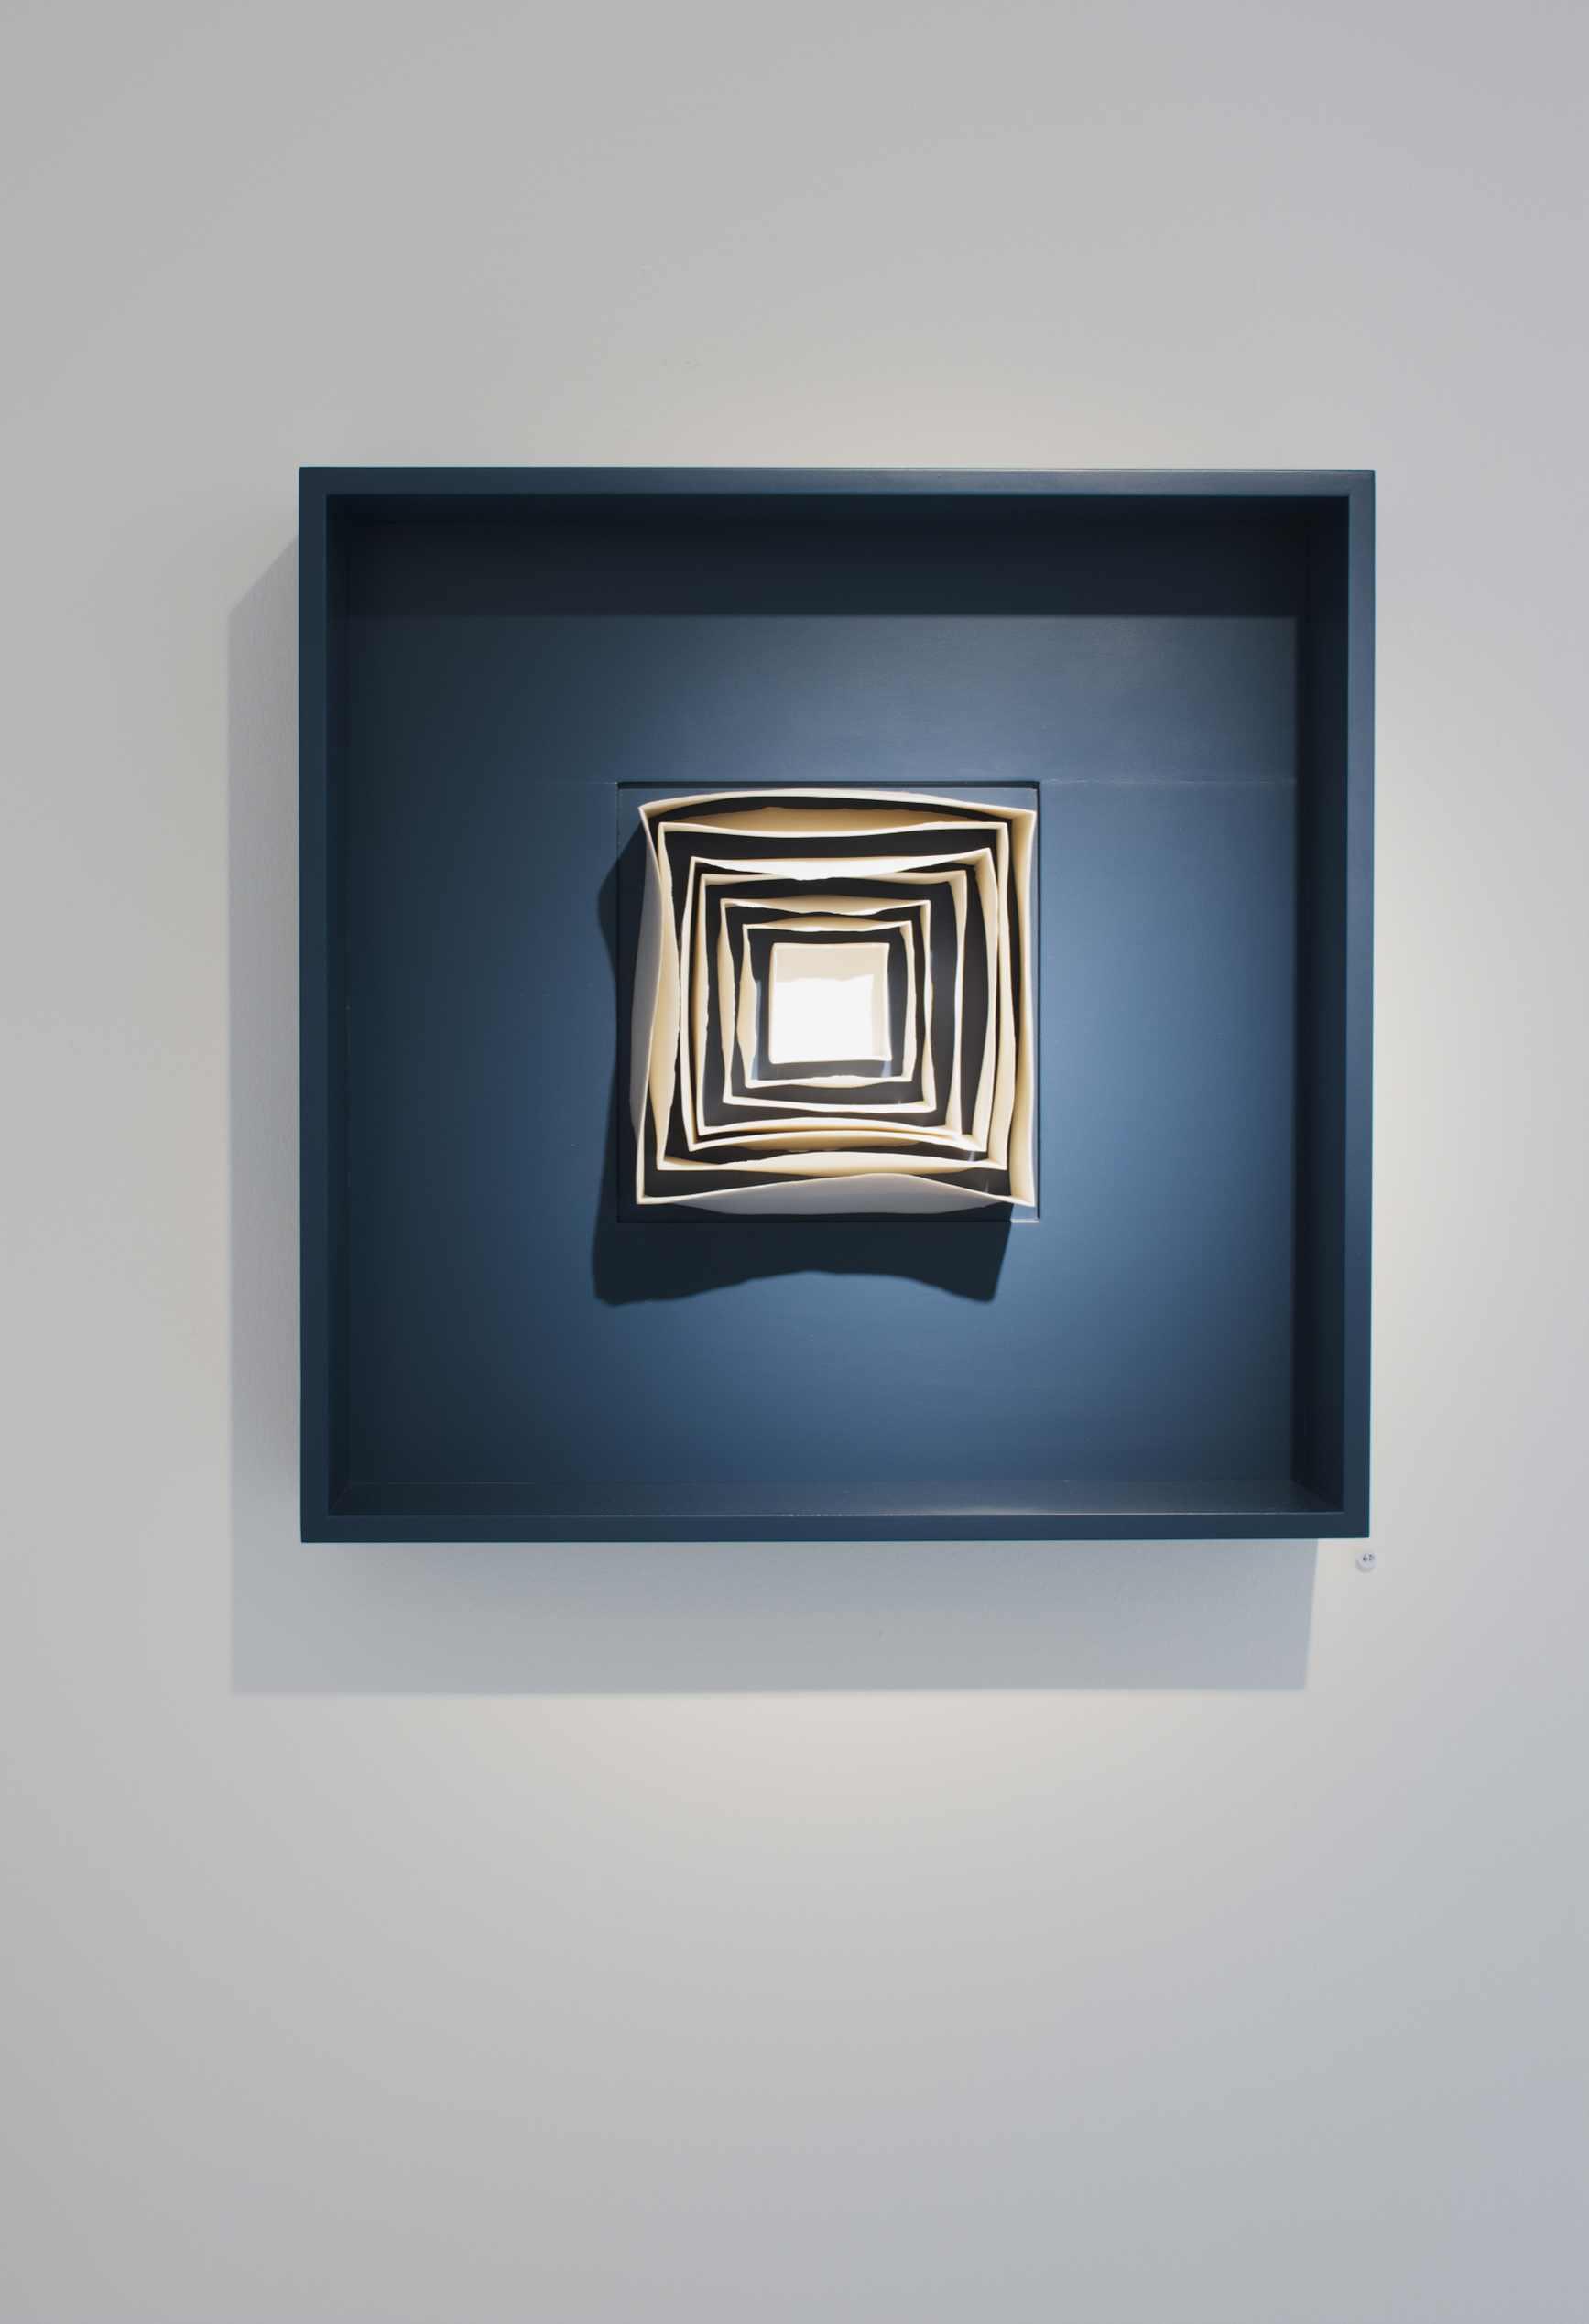 Isobel Egan, Introspection II, porcelain, 60x60cm, EUR 3360